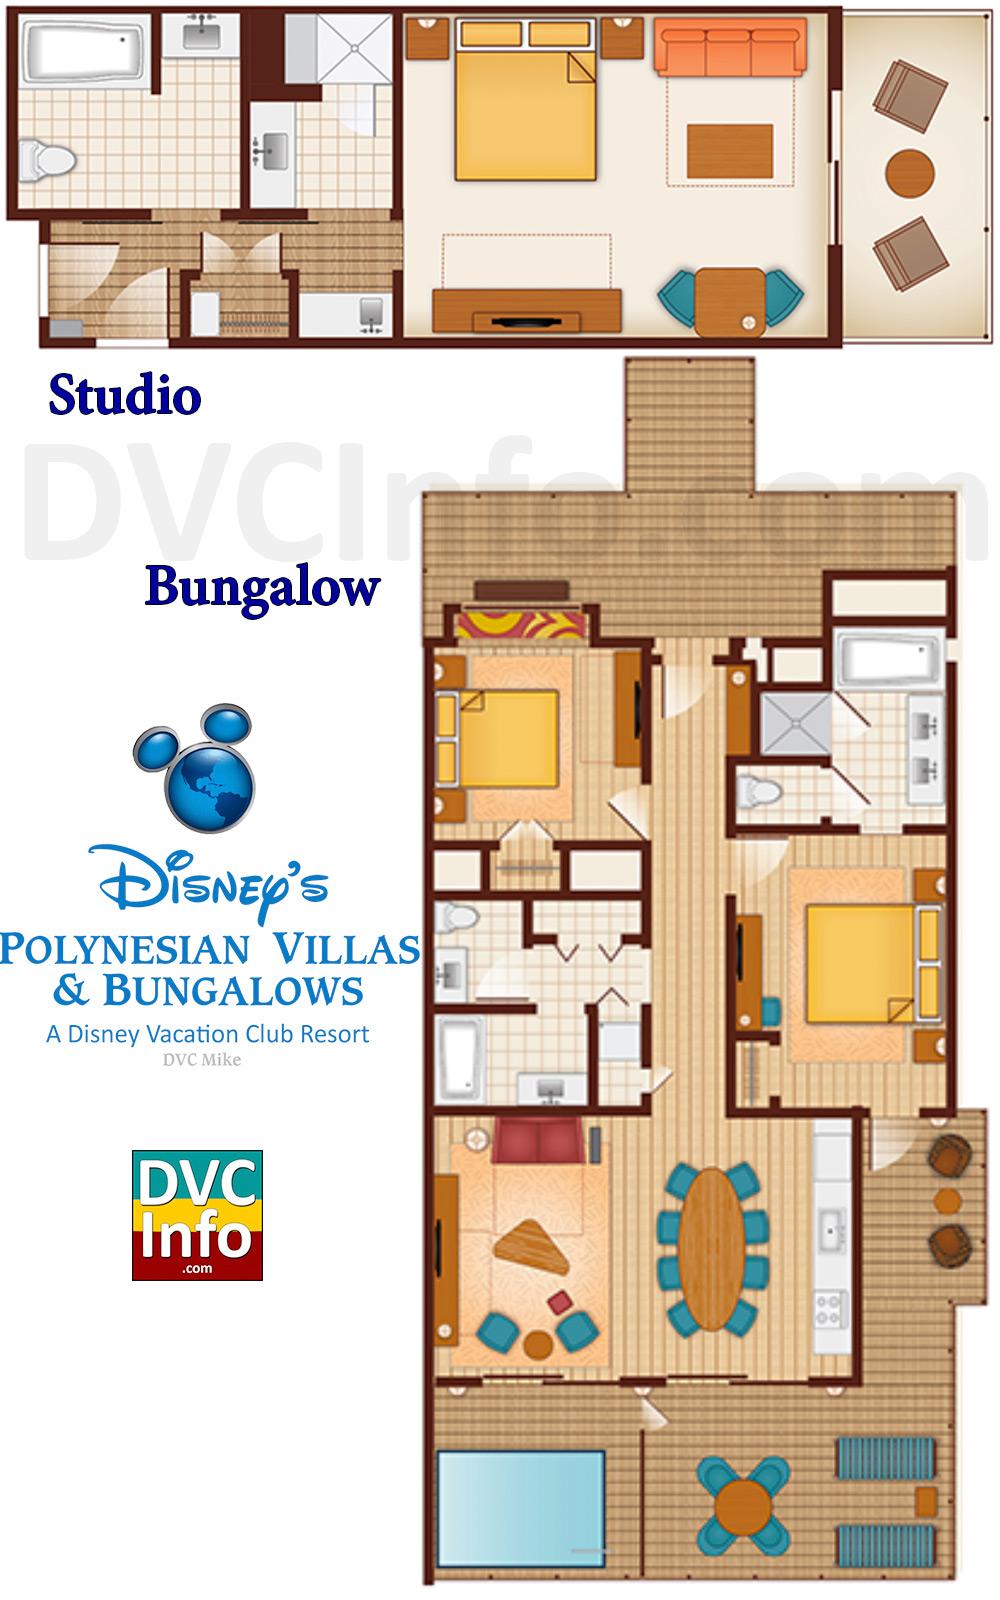 Disney S Polynesian Villas Amp Bungalows Dvcinfo Com